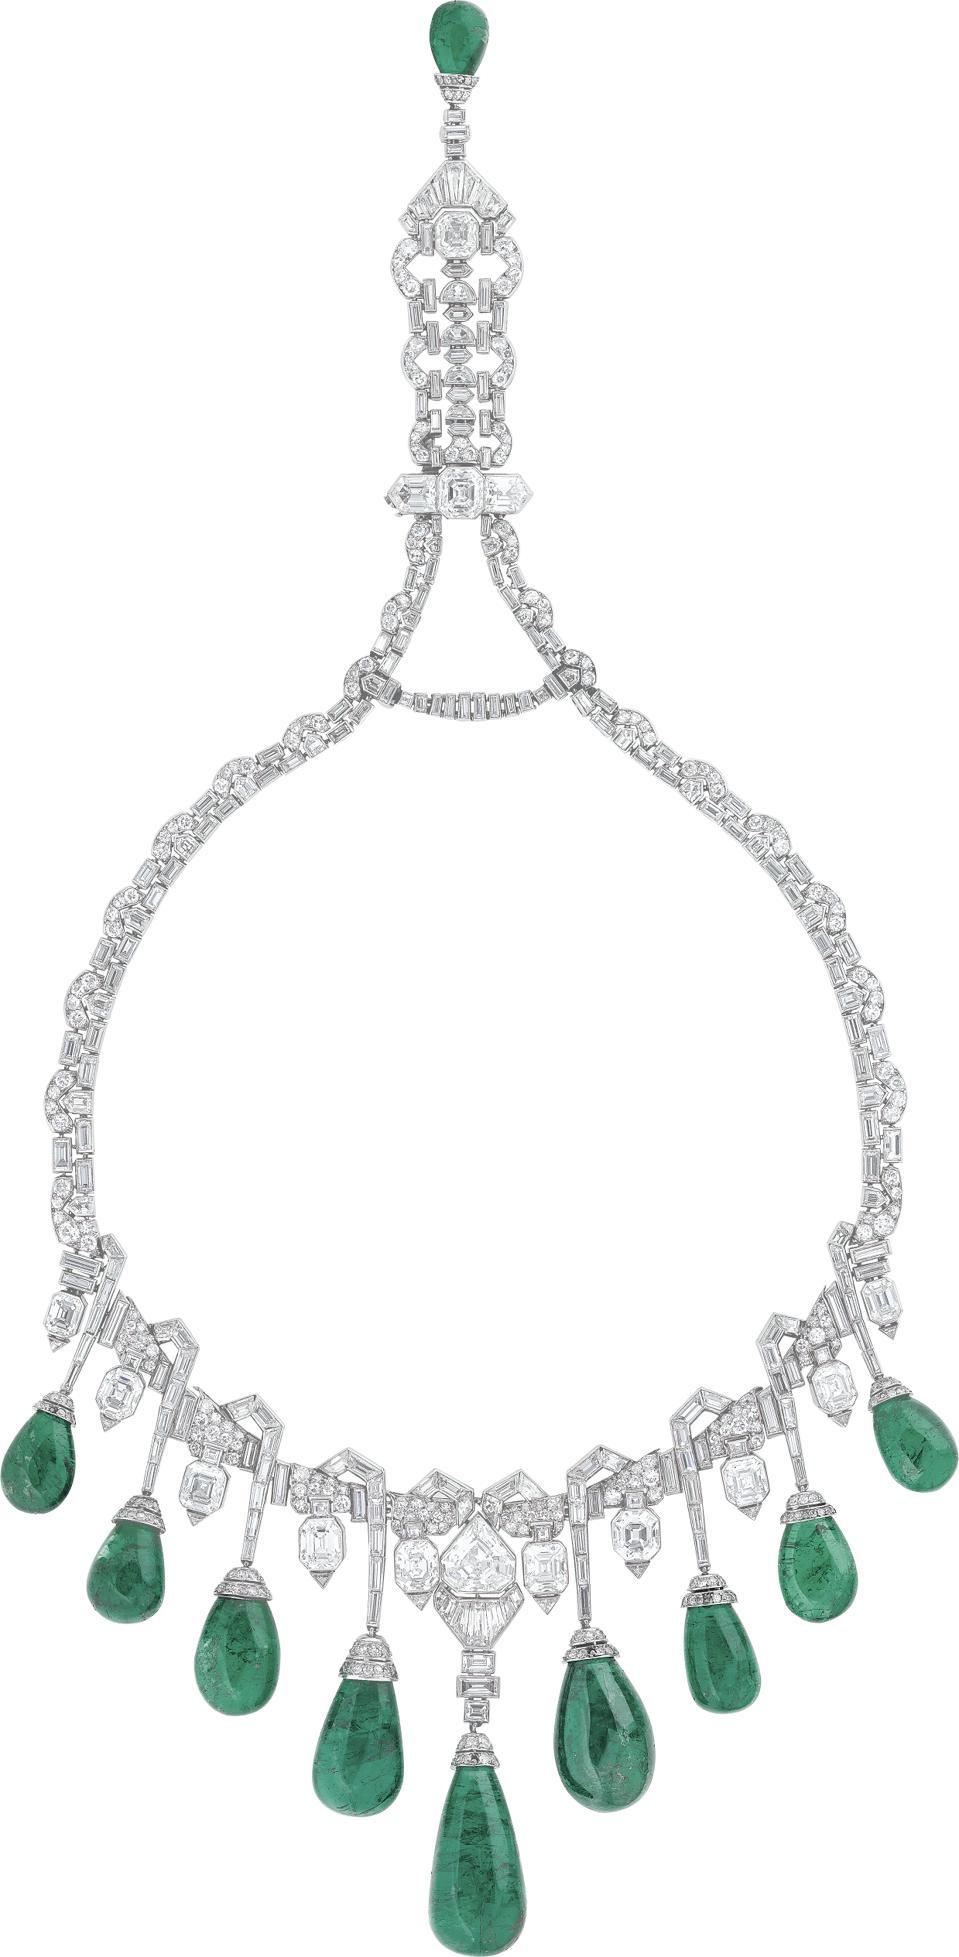 The original Van Cleef & Arpels Merveille d'émeraudes necklace owned by Princess Faiza Rauf